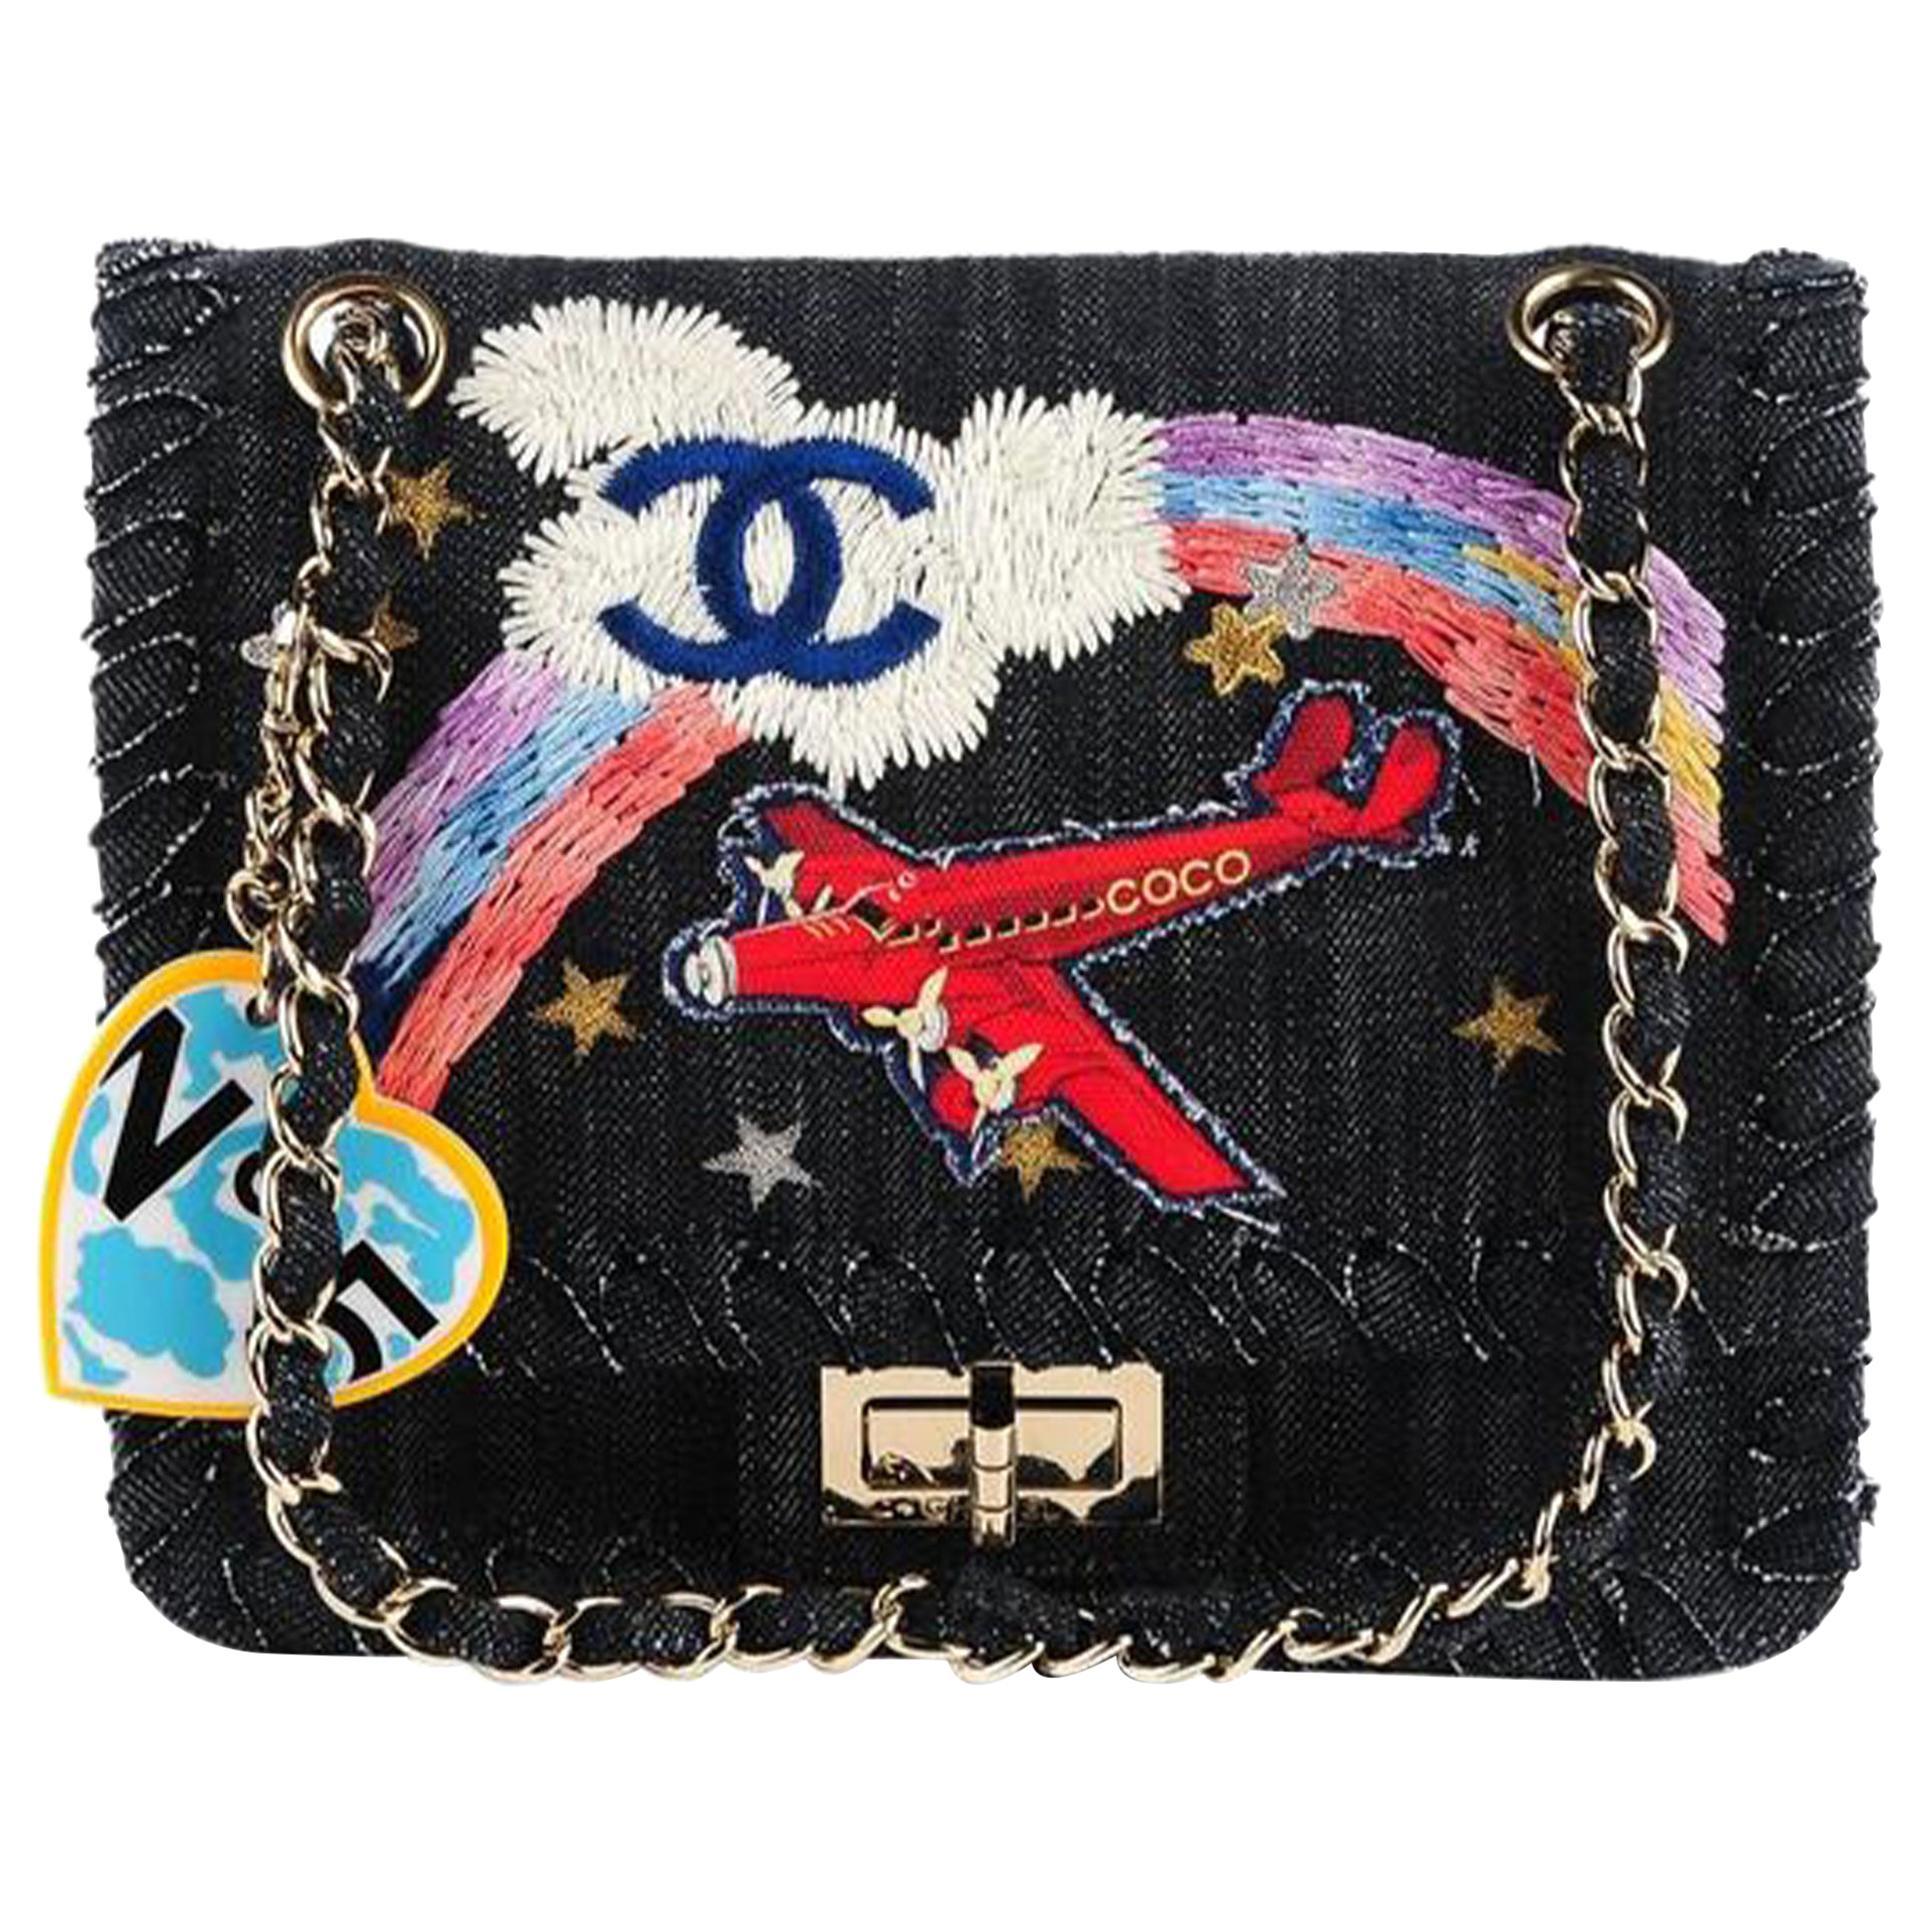 Chanel 2.55 Reissue Limited Edition Airplanes Flap Blue Denim Shoulder Bag